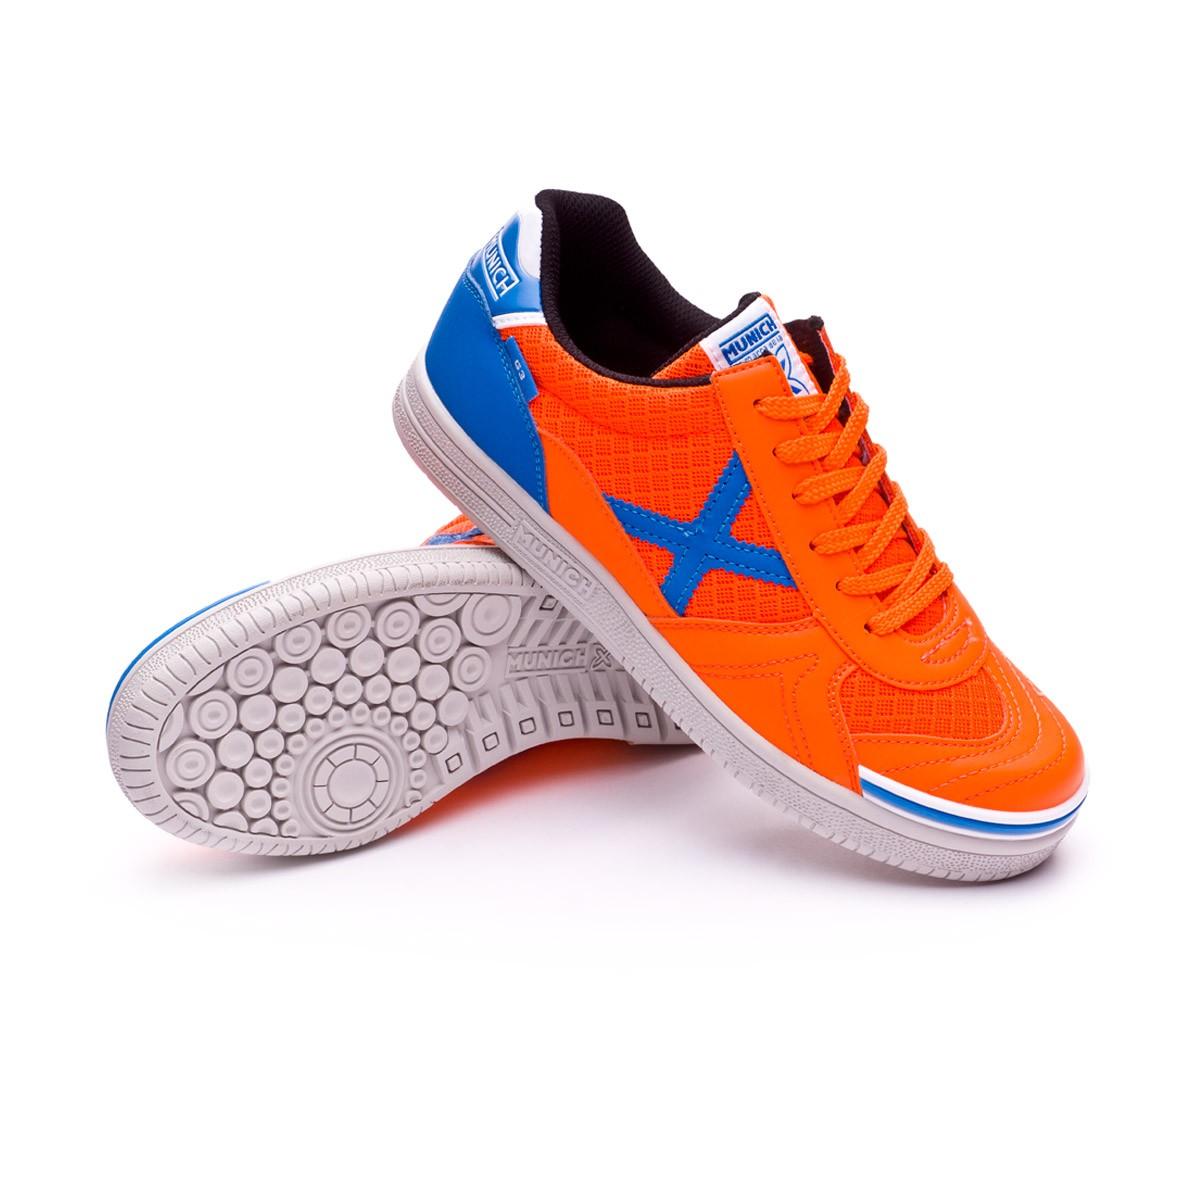 Leaked Zapatilla G3 Munich Naranja Niño Soccer Azul nqqaCXR